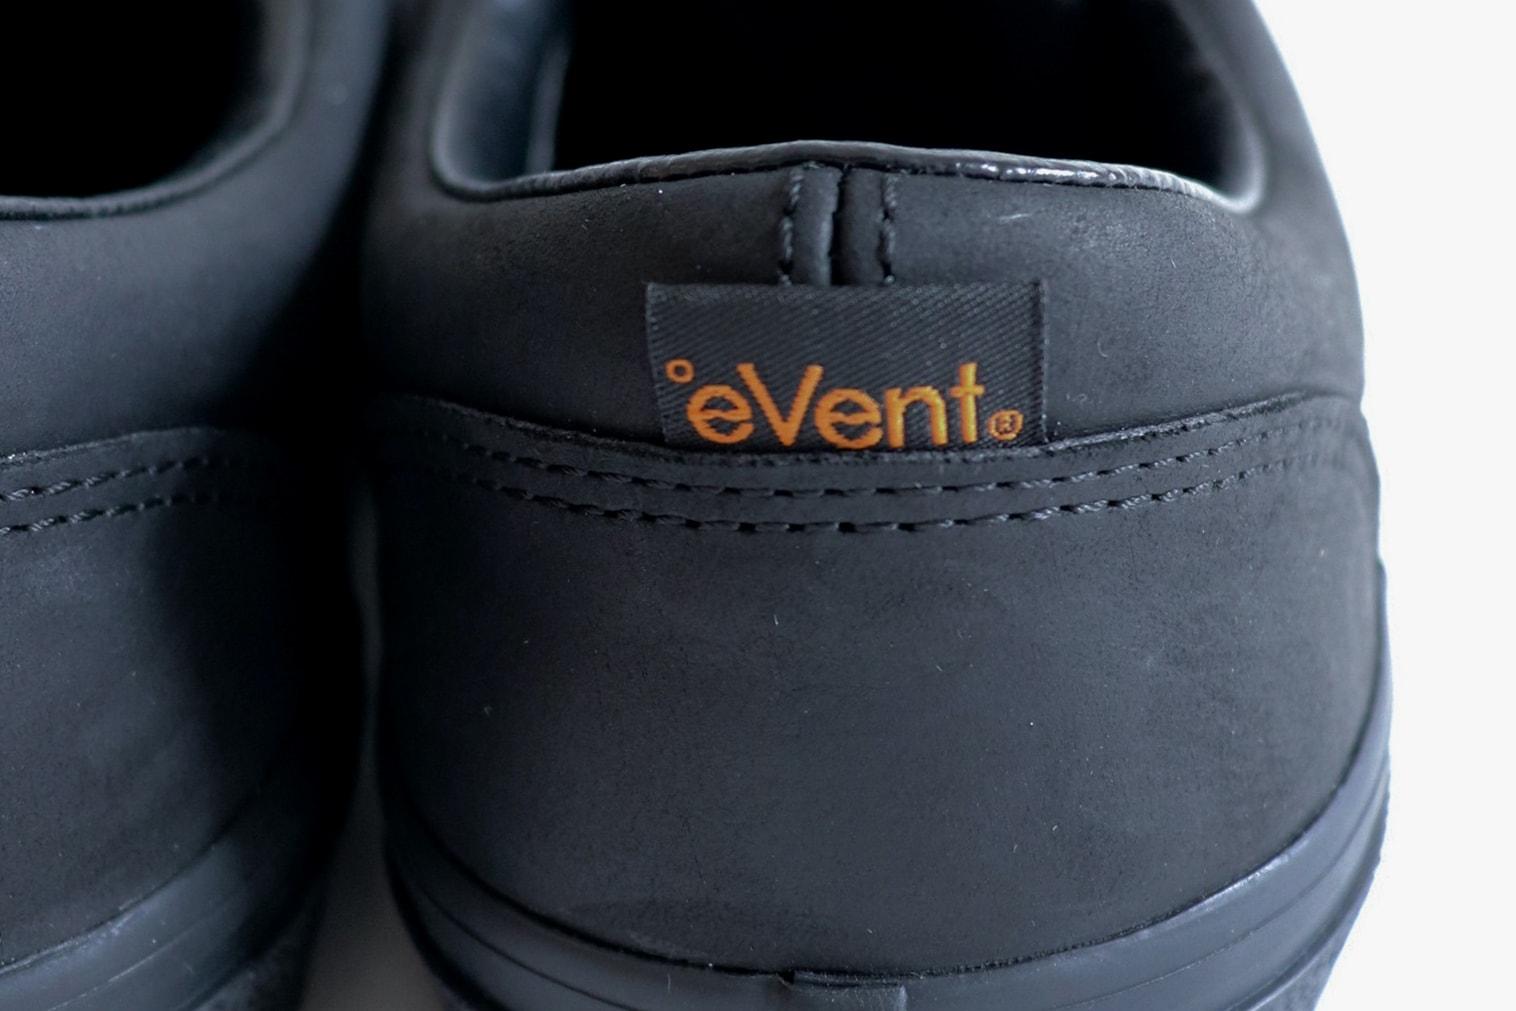 Alexander Lee Chang x Vans Higera FW20 Sneaker Collaboration japan release date info buy december 2020 august pre order event waterproof alexanderleechang fall winter